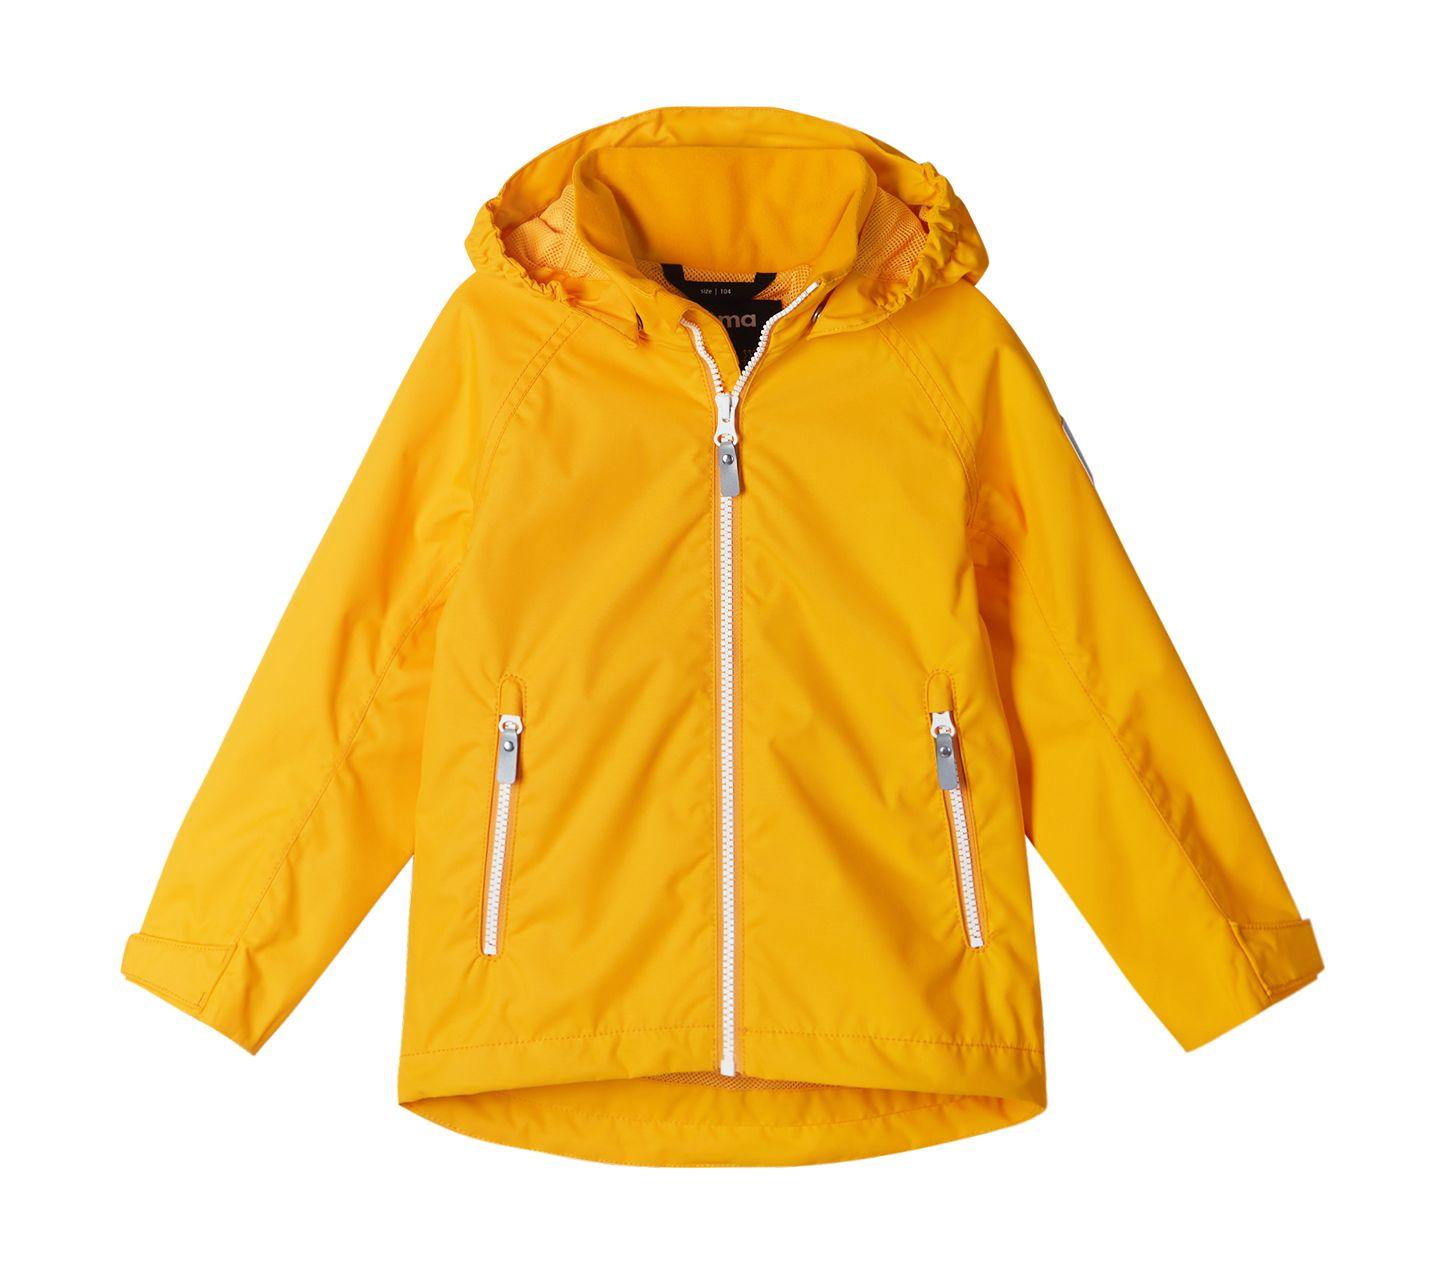 REIMA Soutu 521601A Orange Yellow 134